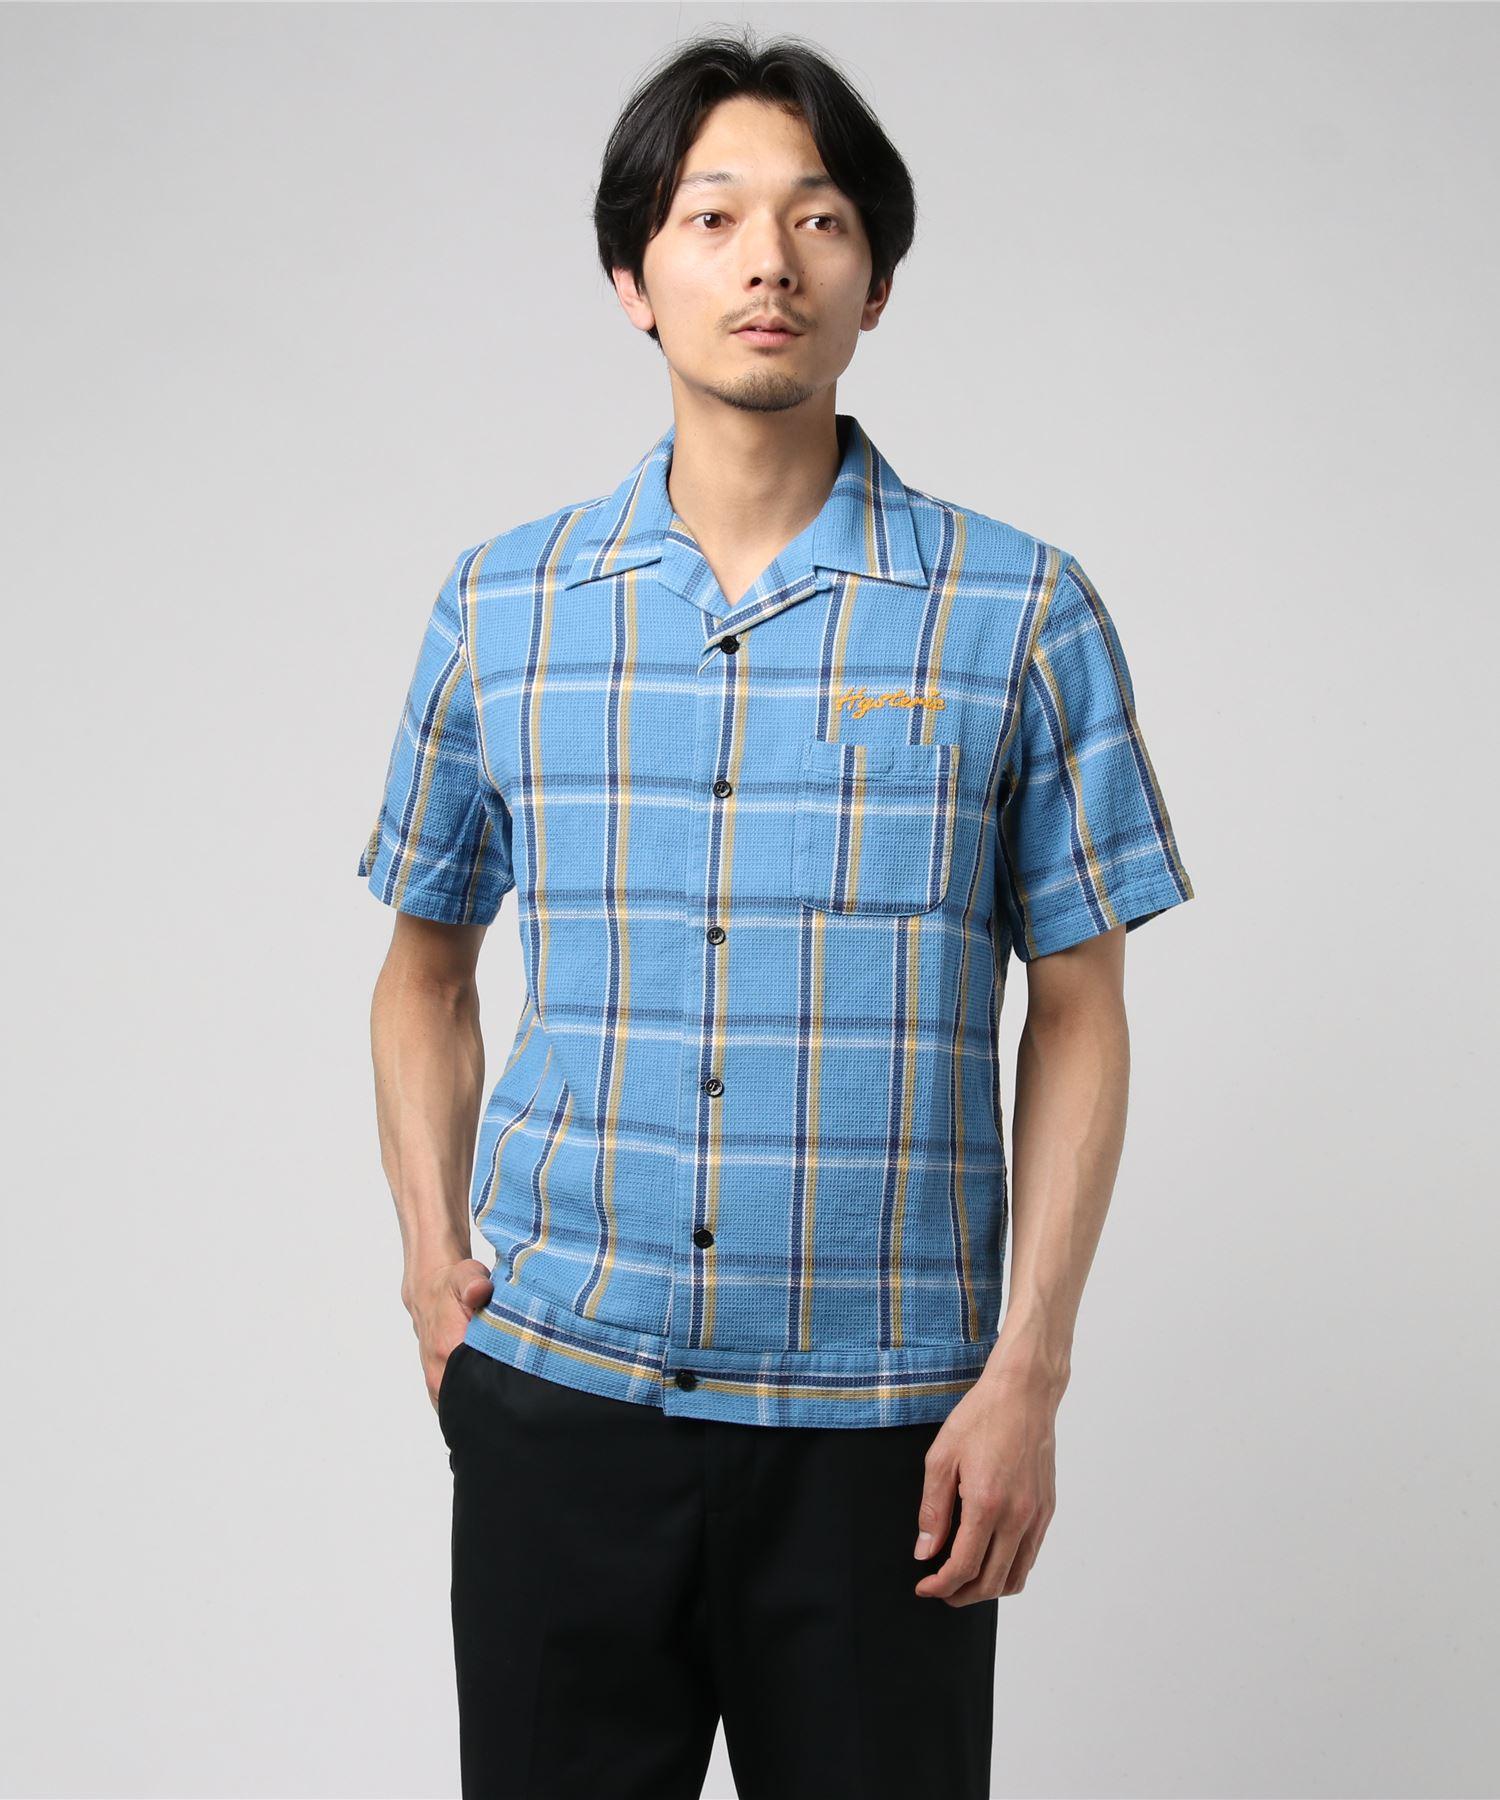 Hysteric Lovers刺繍 半袖オープンカラーシャツ